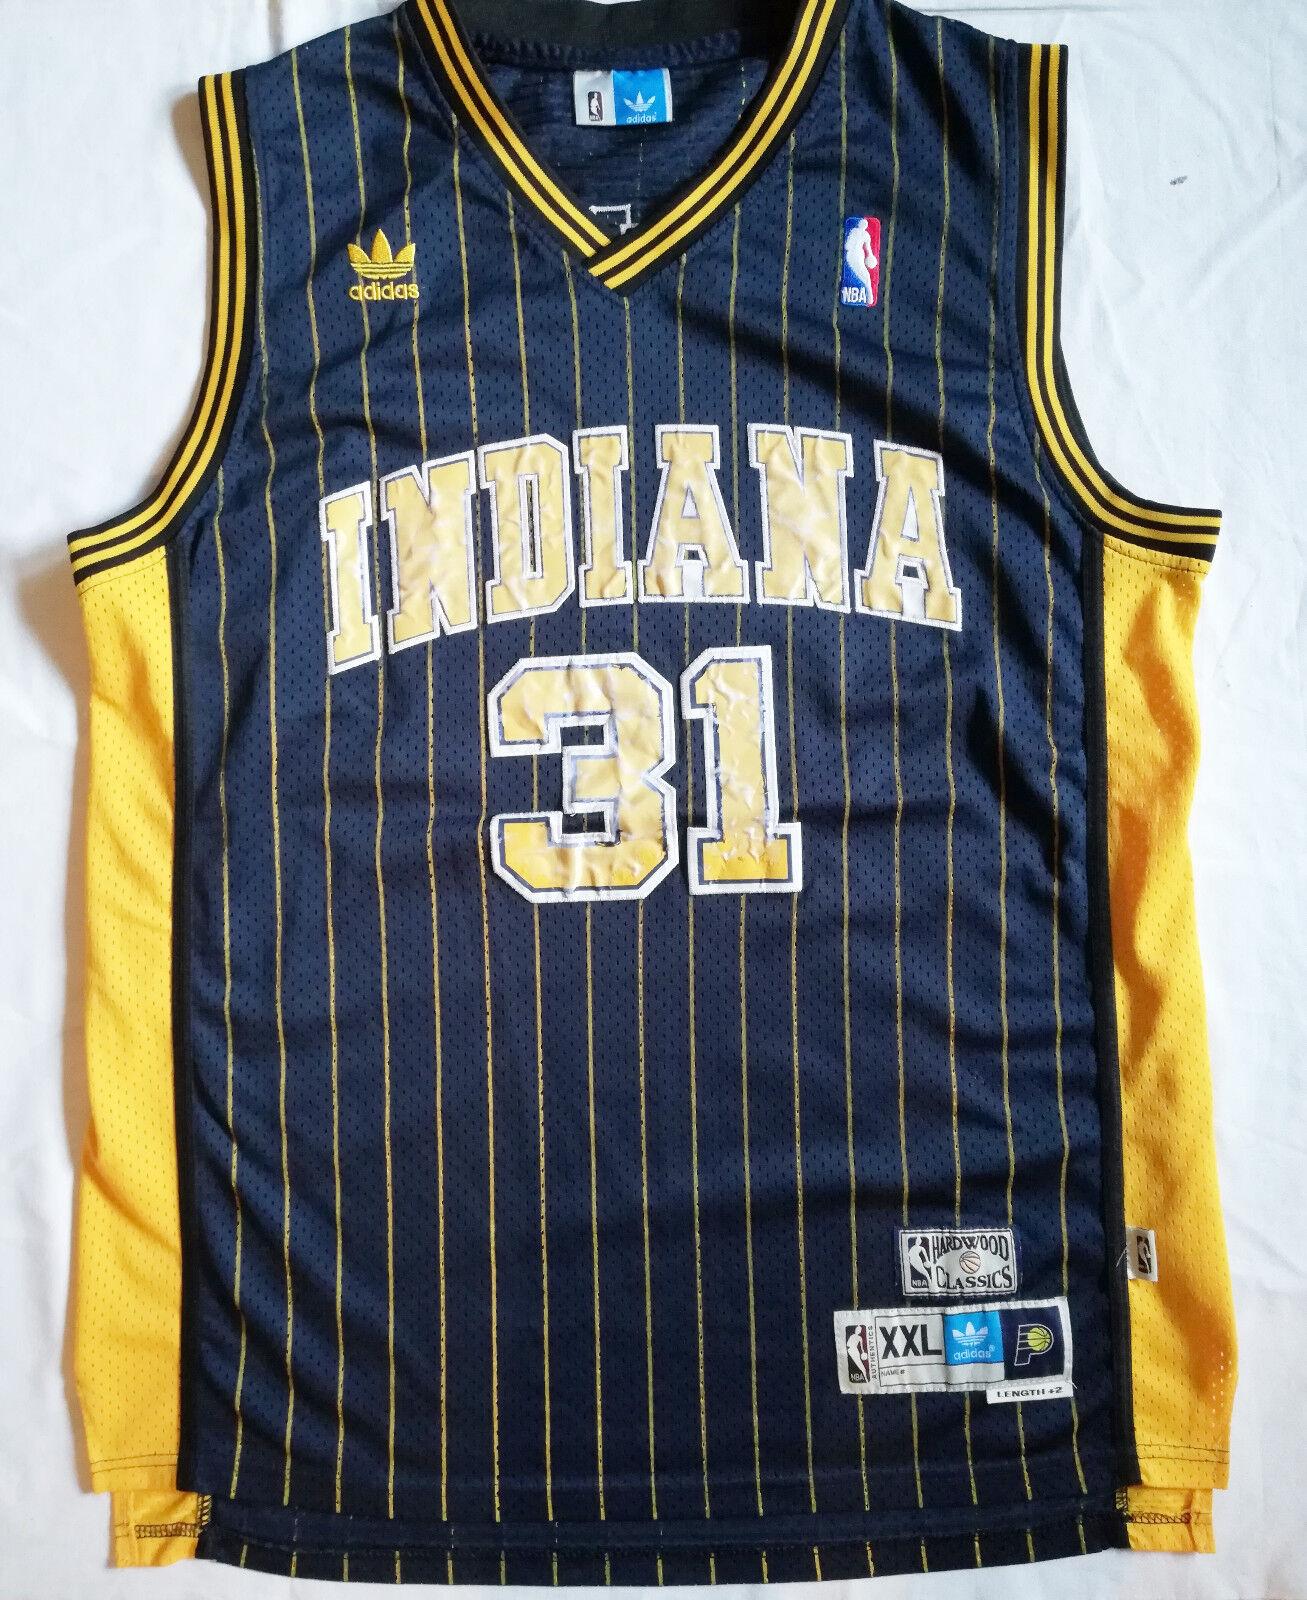 Vintage Indiana Pacers NBA basketball jersey Reggie Miller HARDWOOD CLASICS